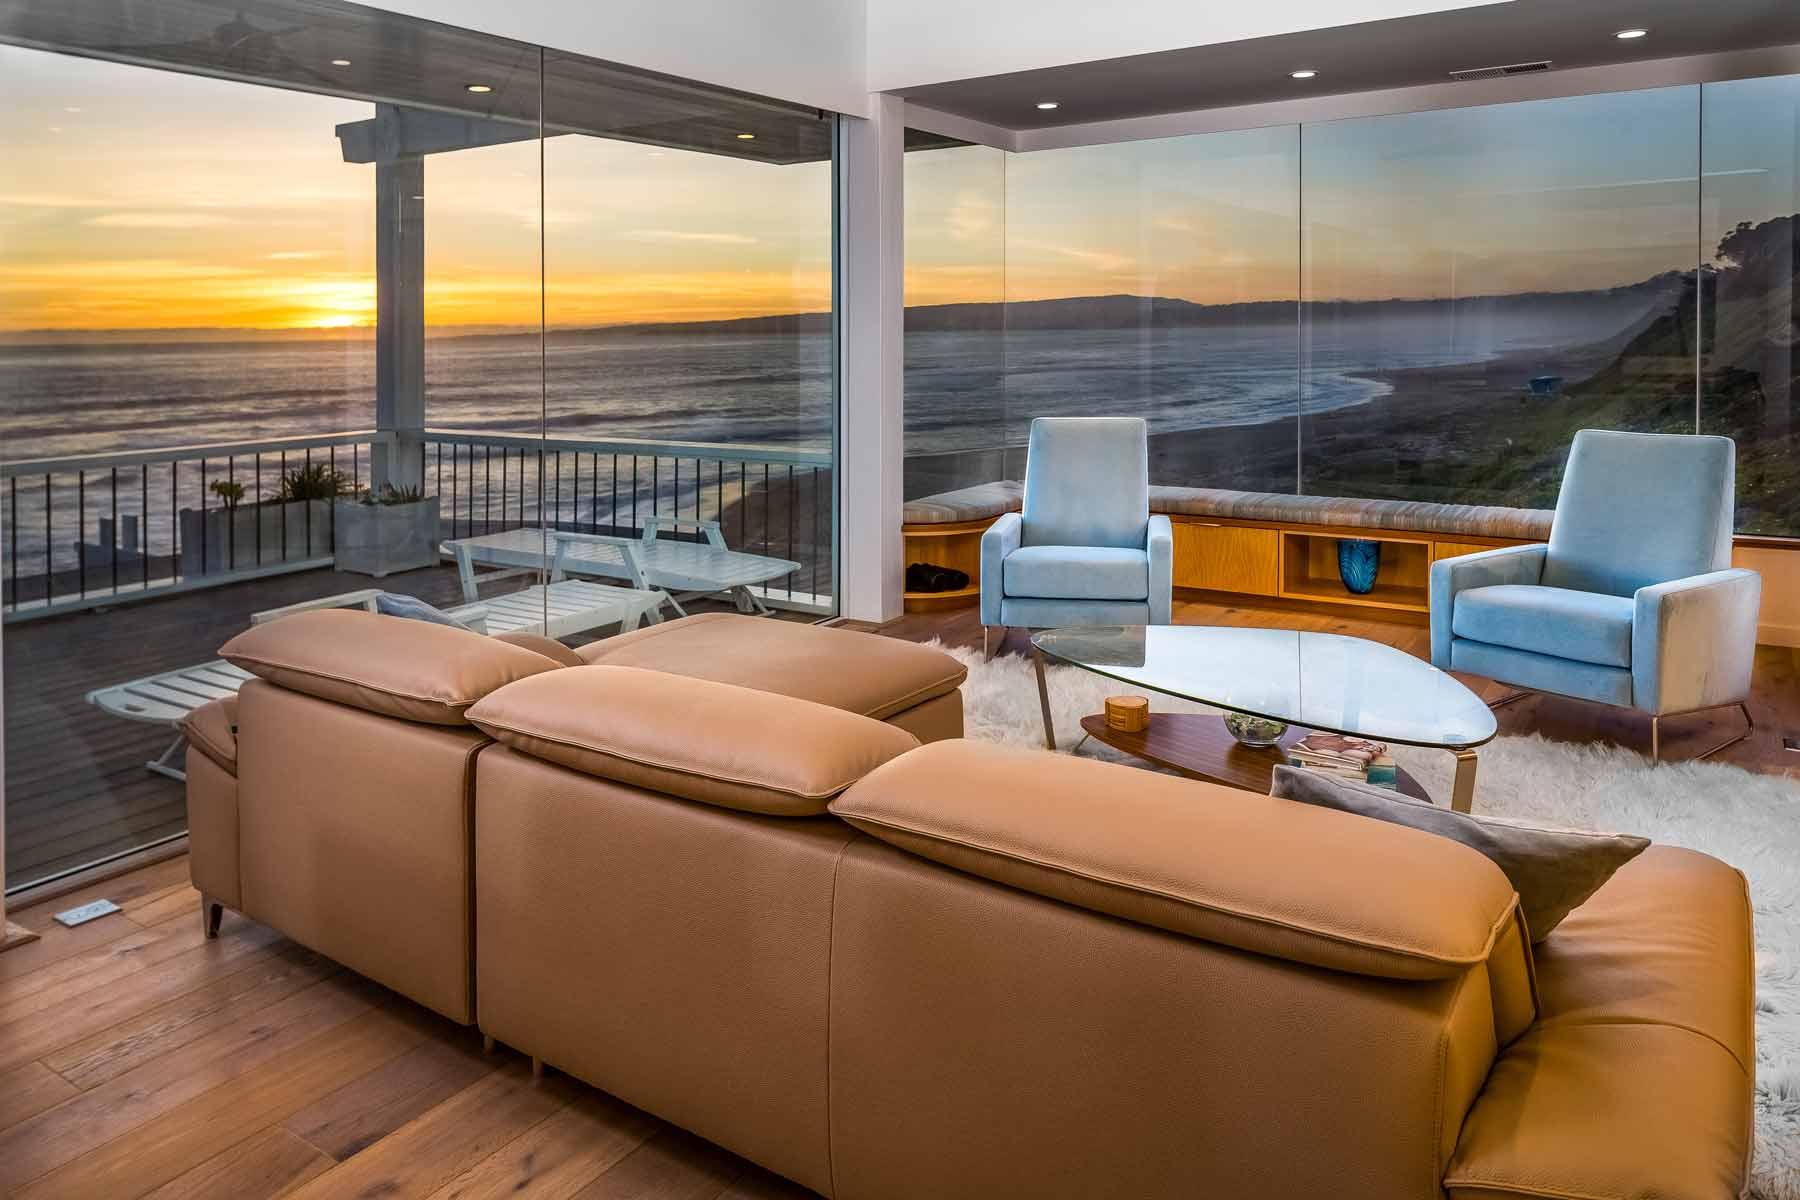 Glass Walls to Enhance Views